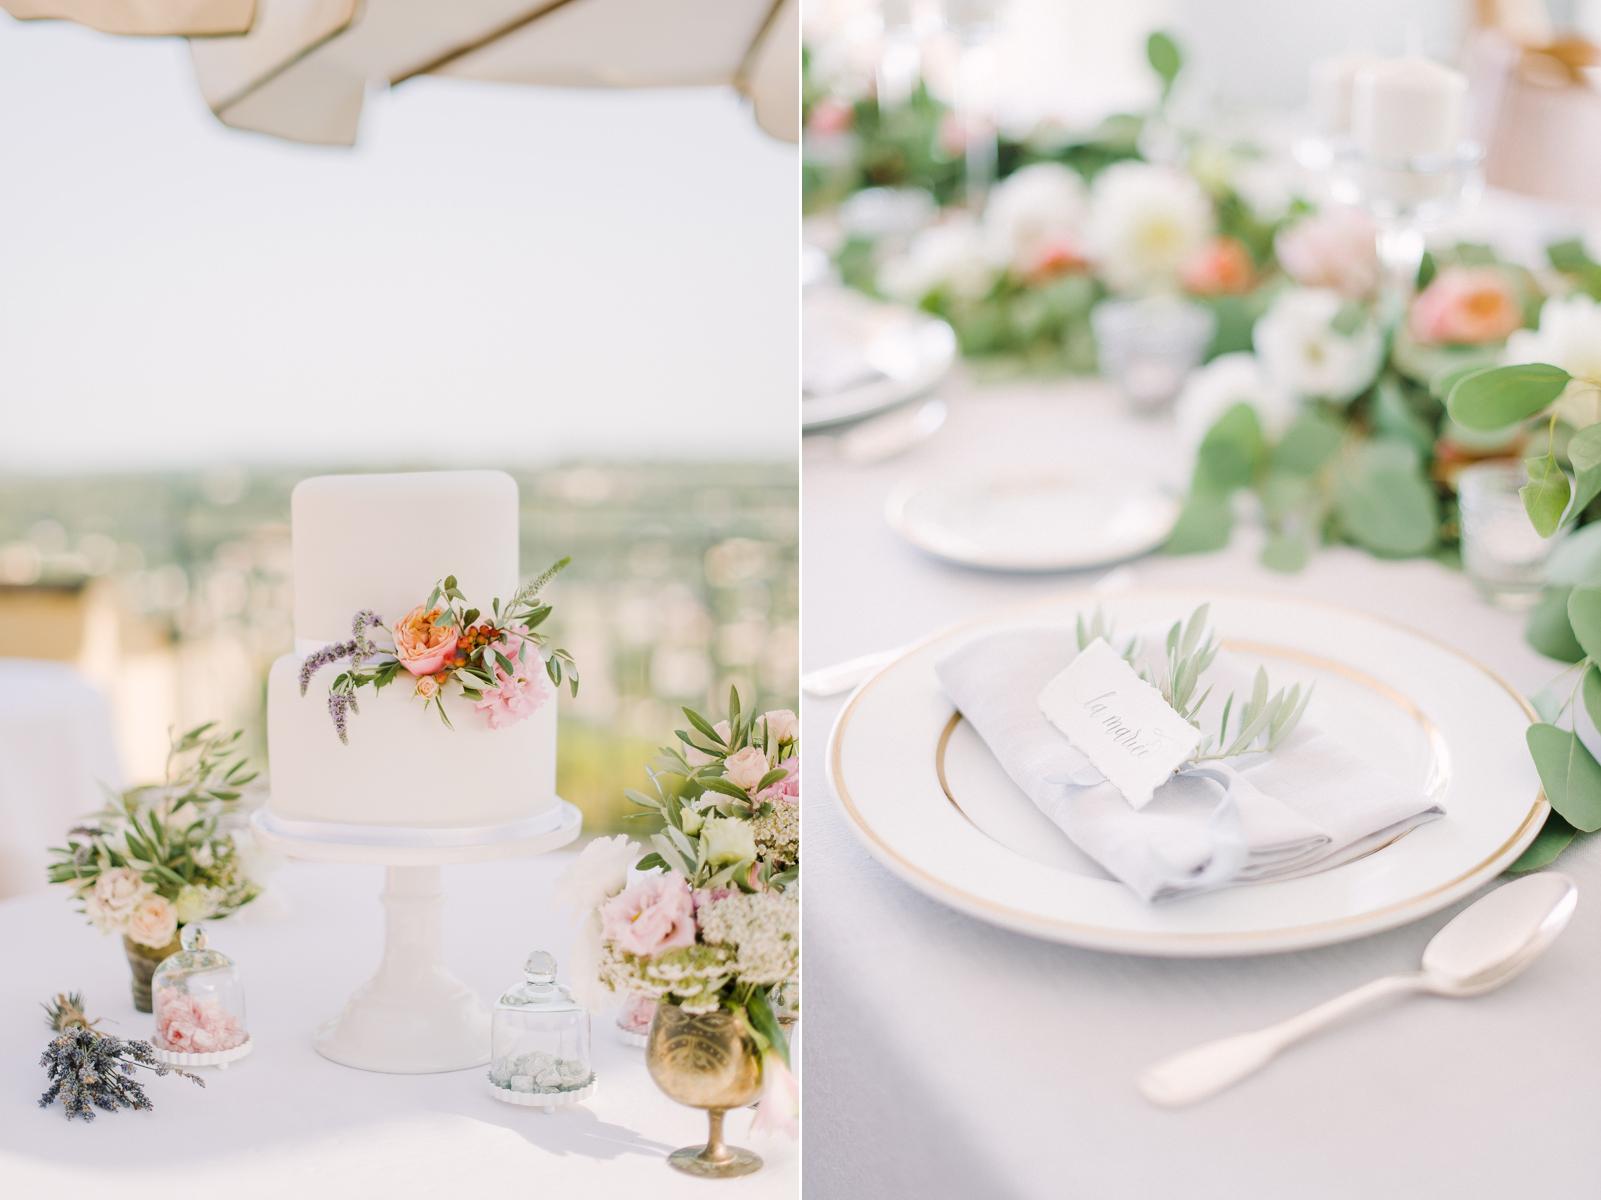 BohemeMoonPhotography-Grasse-provence-wedding-photographer_29.jpg